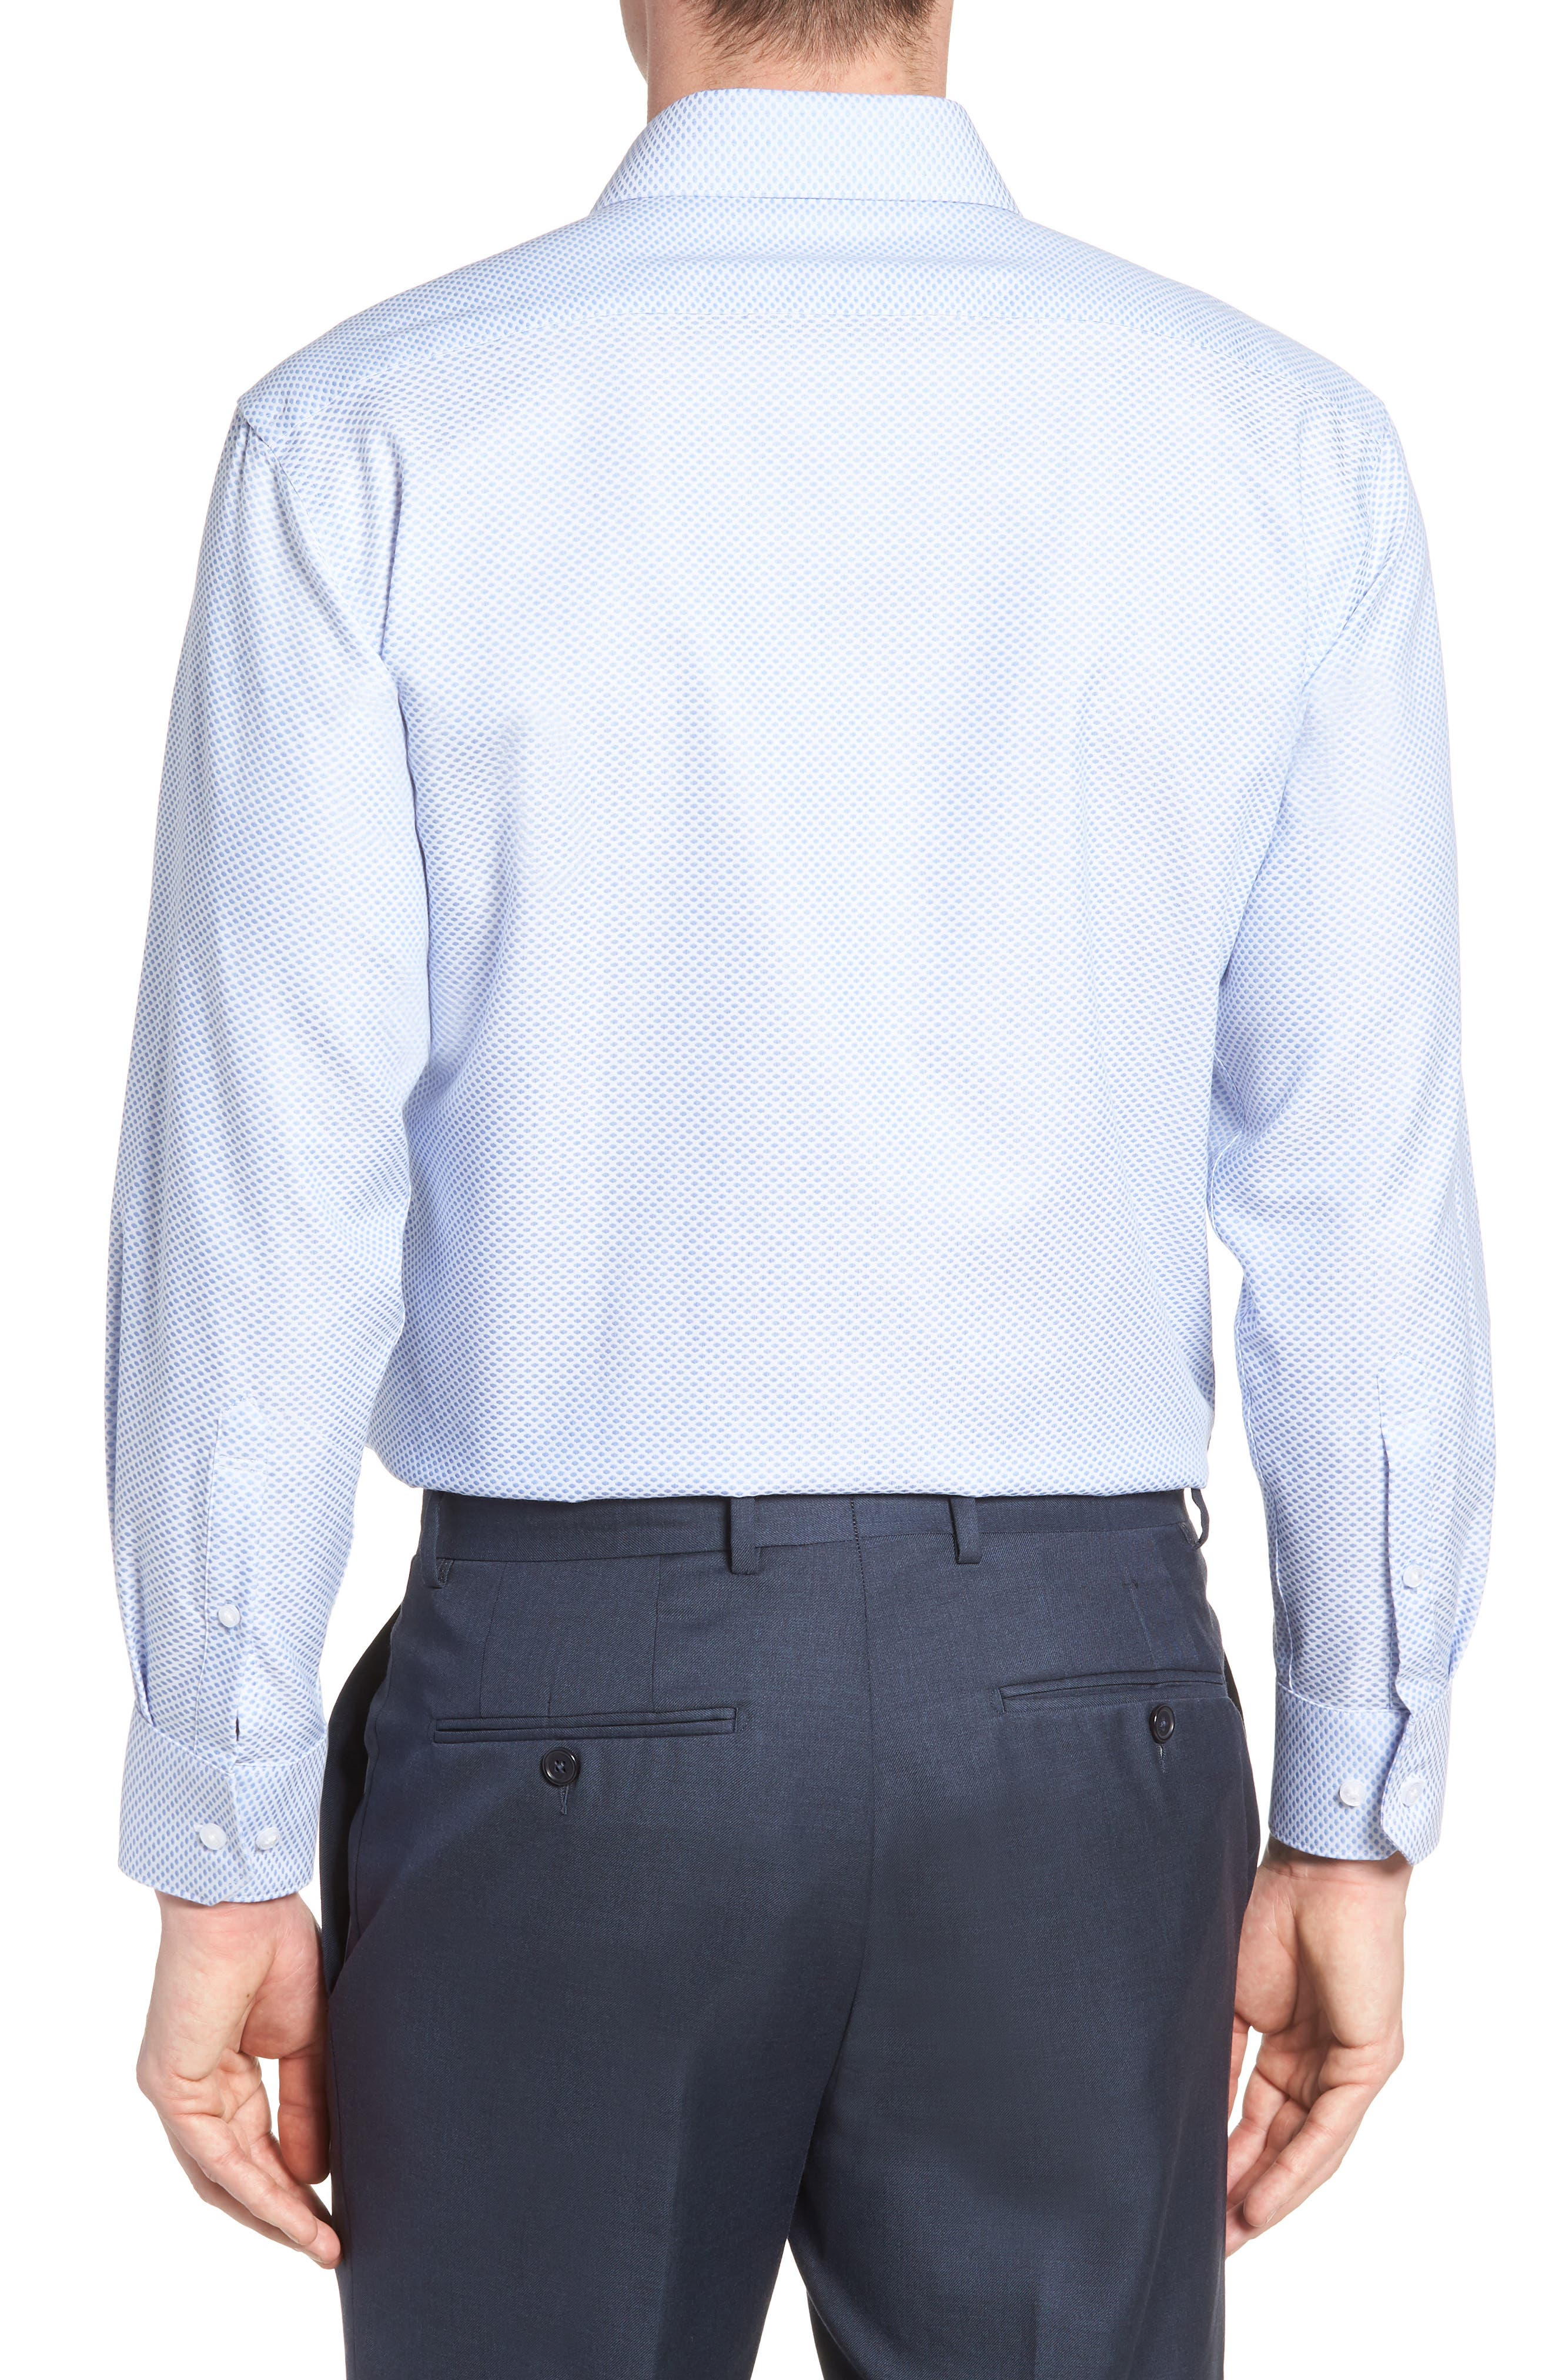 Bigbenn Trim Fit Dot Dress Shirt,                             Alternate thumbnail 3, color,                             BLUE